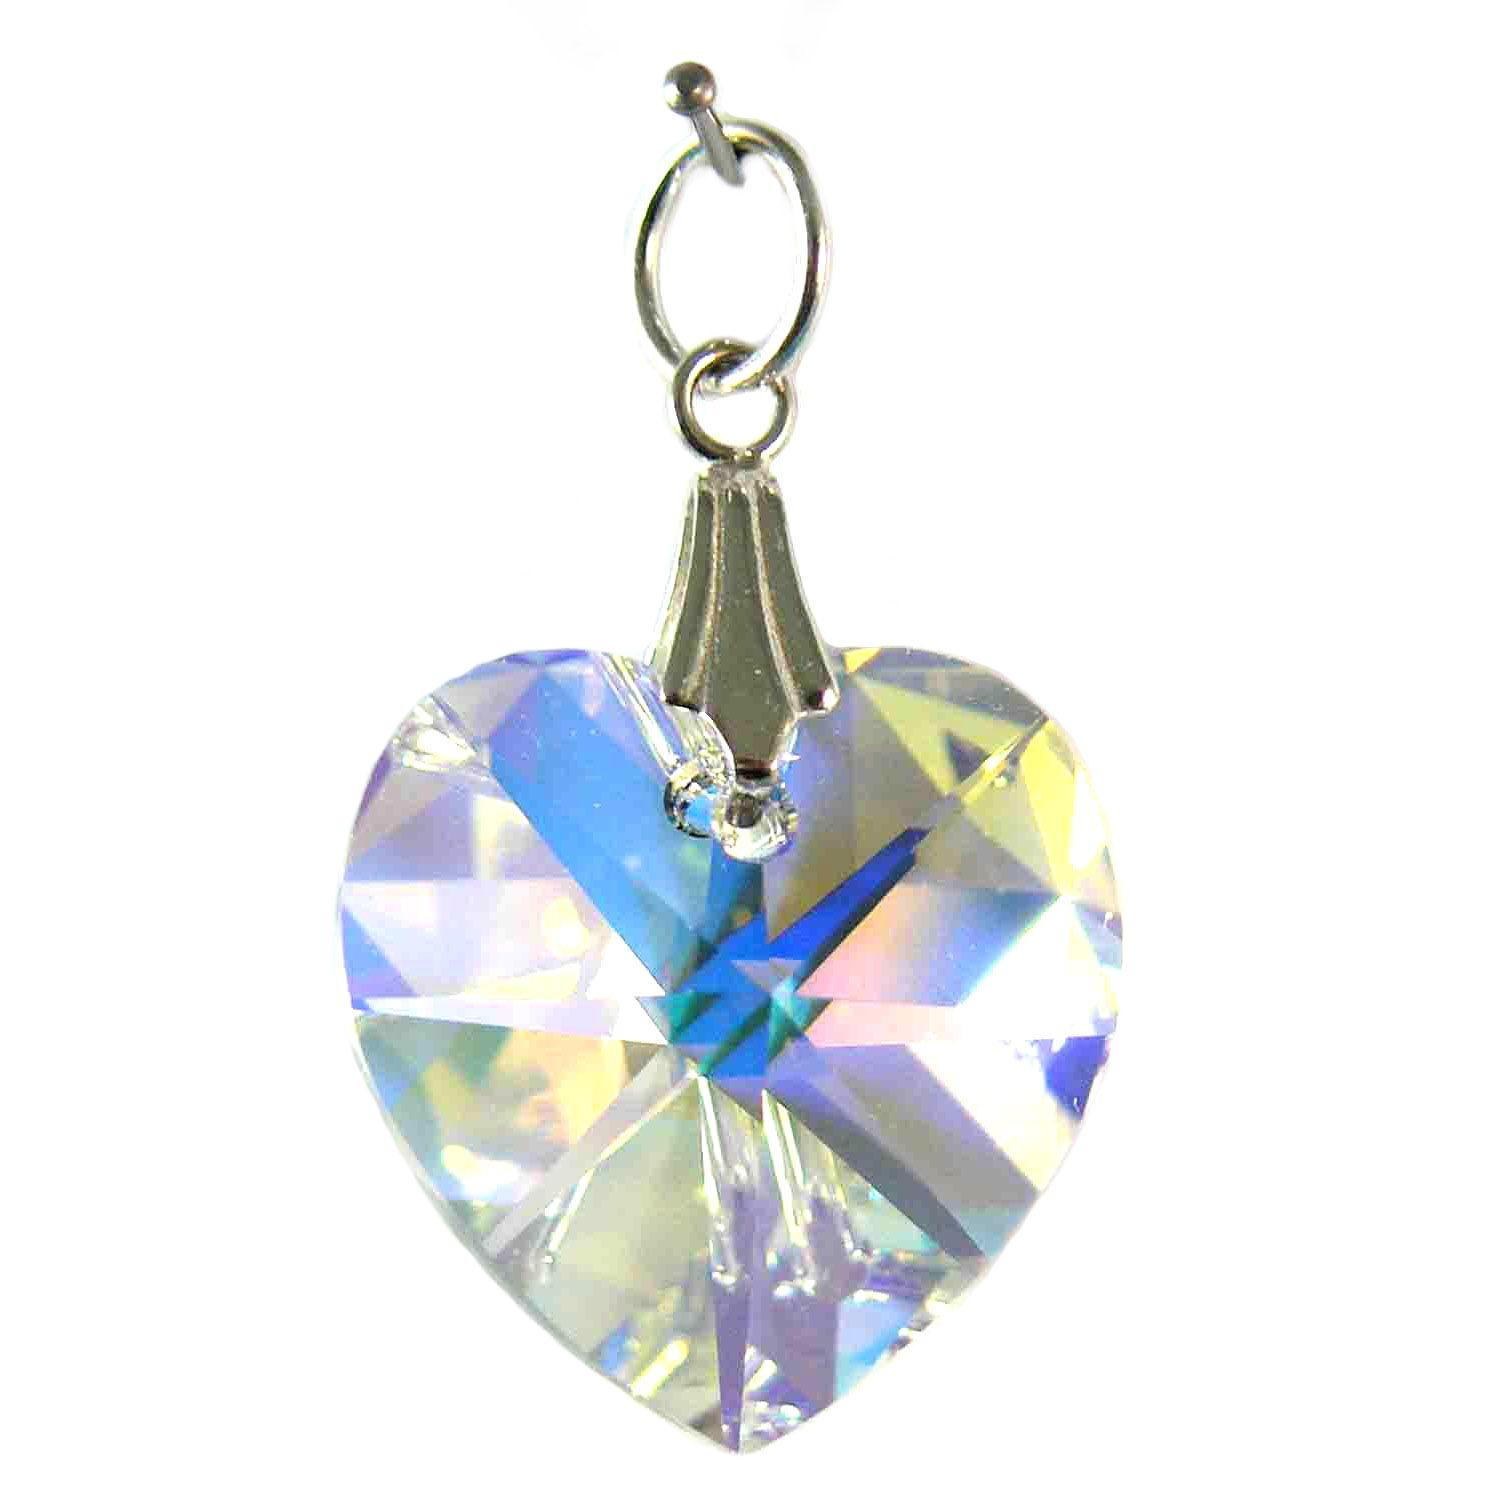 Charm school uk swarovski crystal pendants aurore borealis heart swarovski aurora borealis heart crystal pendants silver bail aloadofball Images